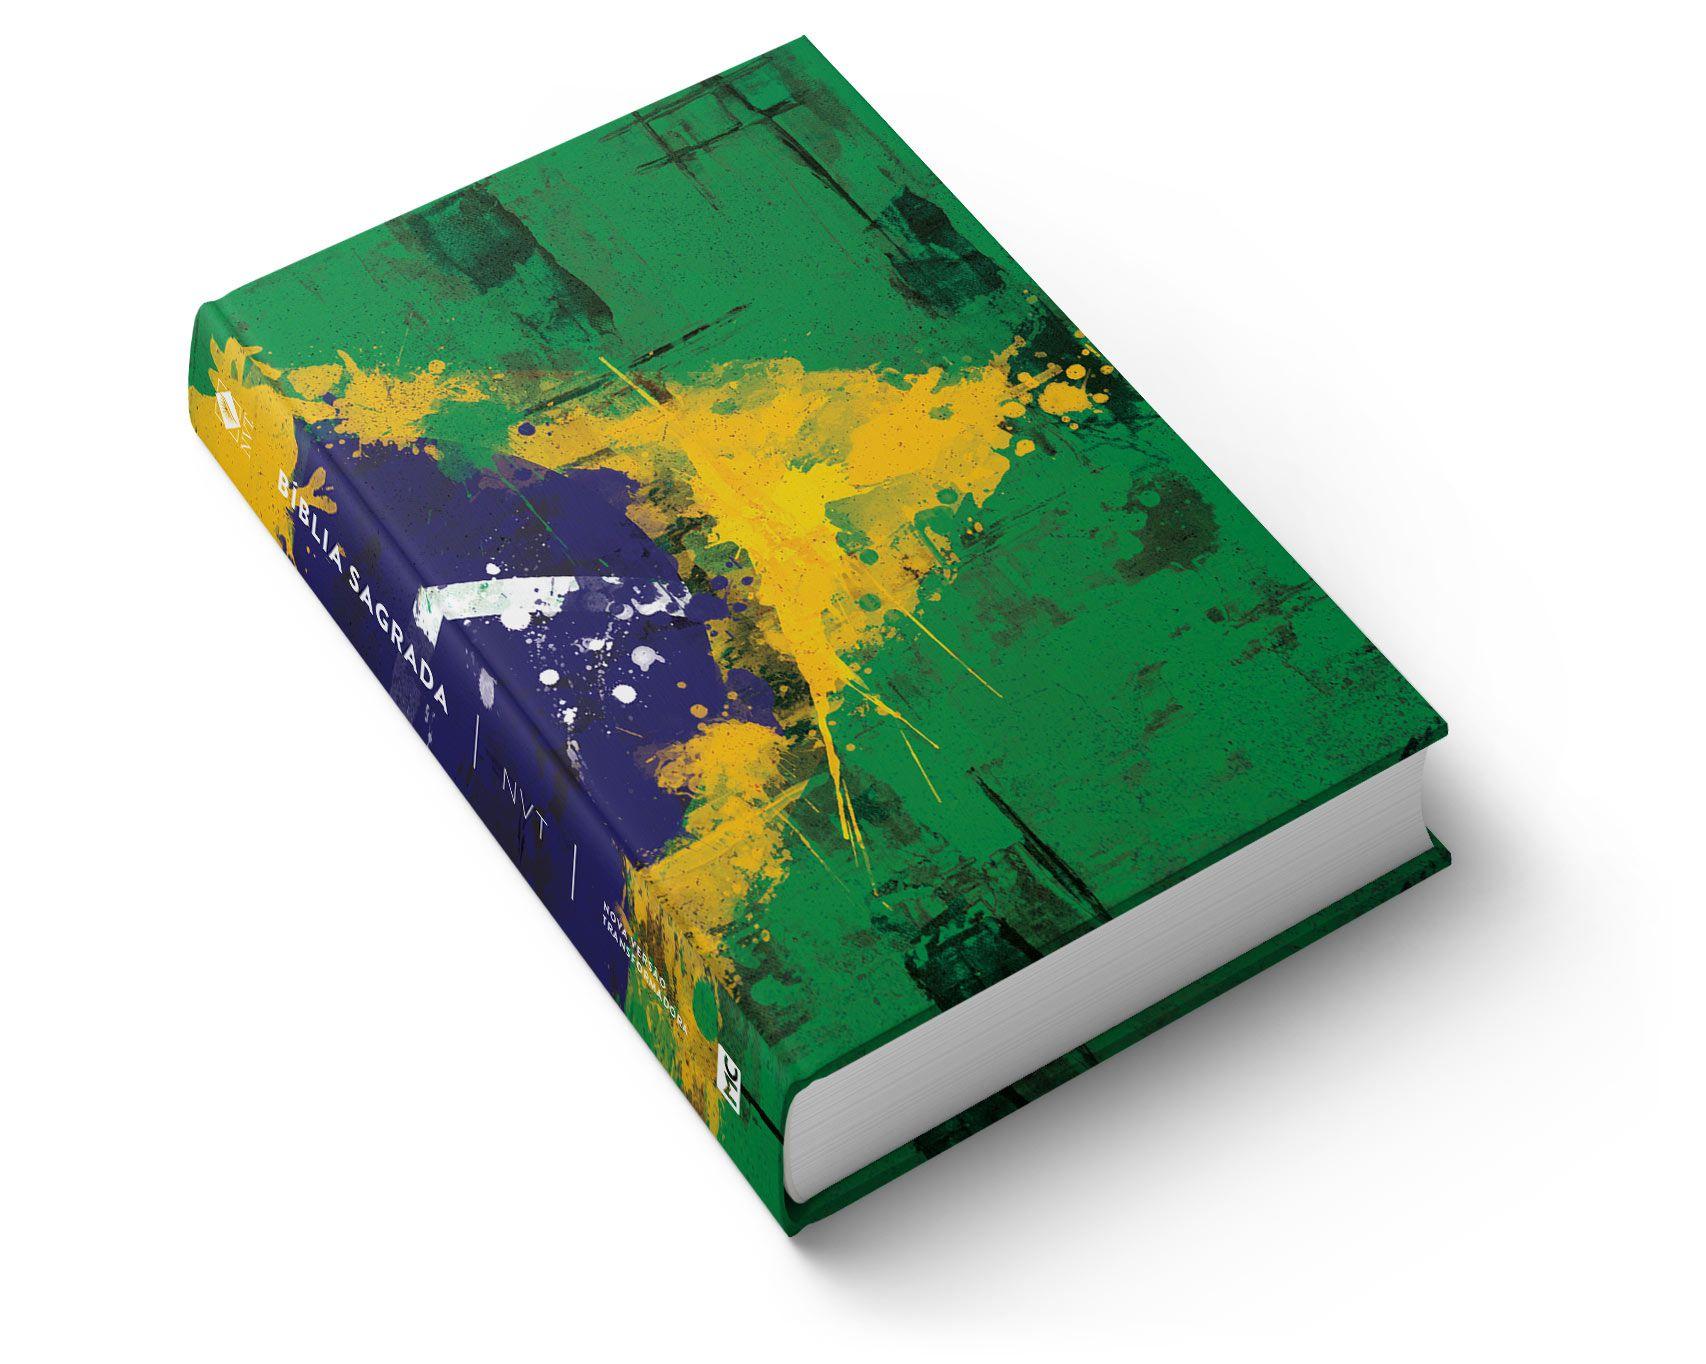 Bíblia NVT Meu Brasil  - Sua Bíblia NVT